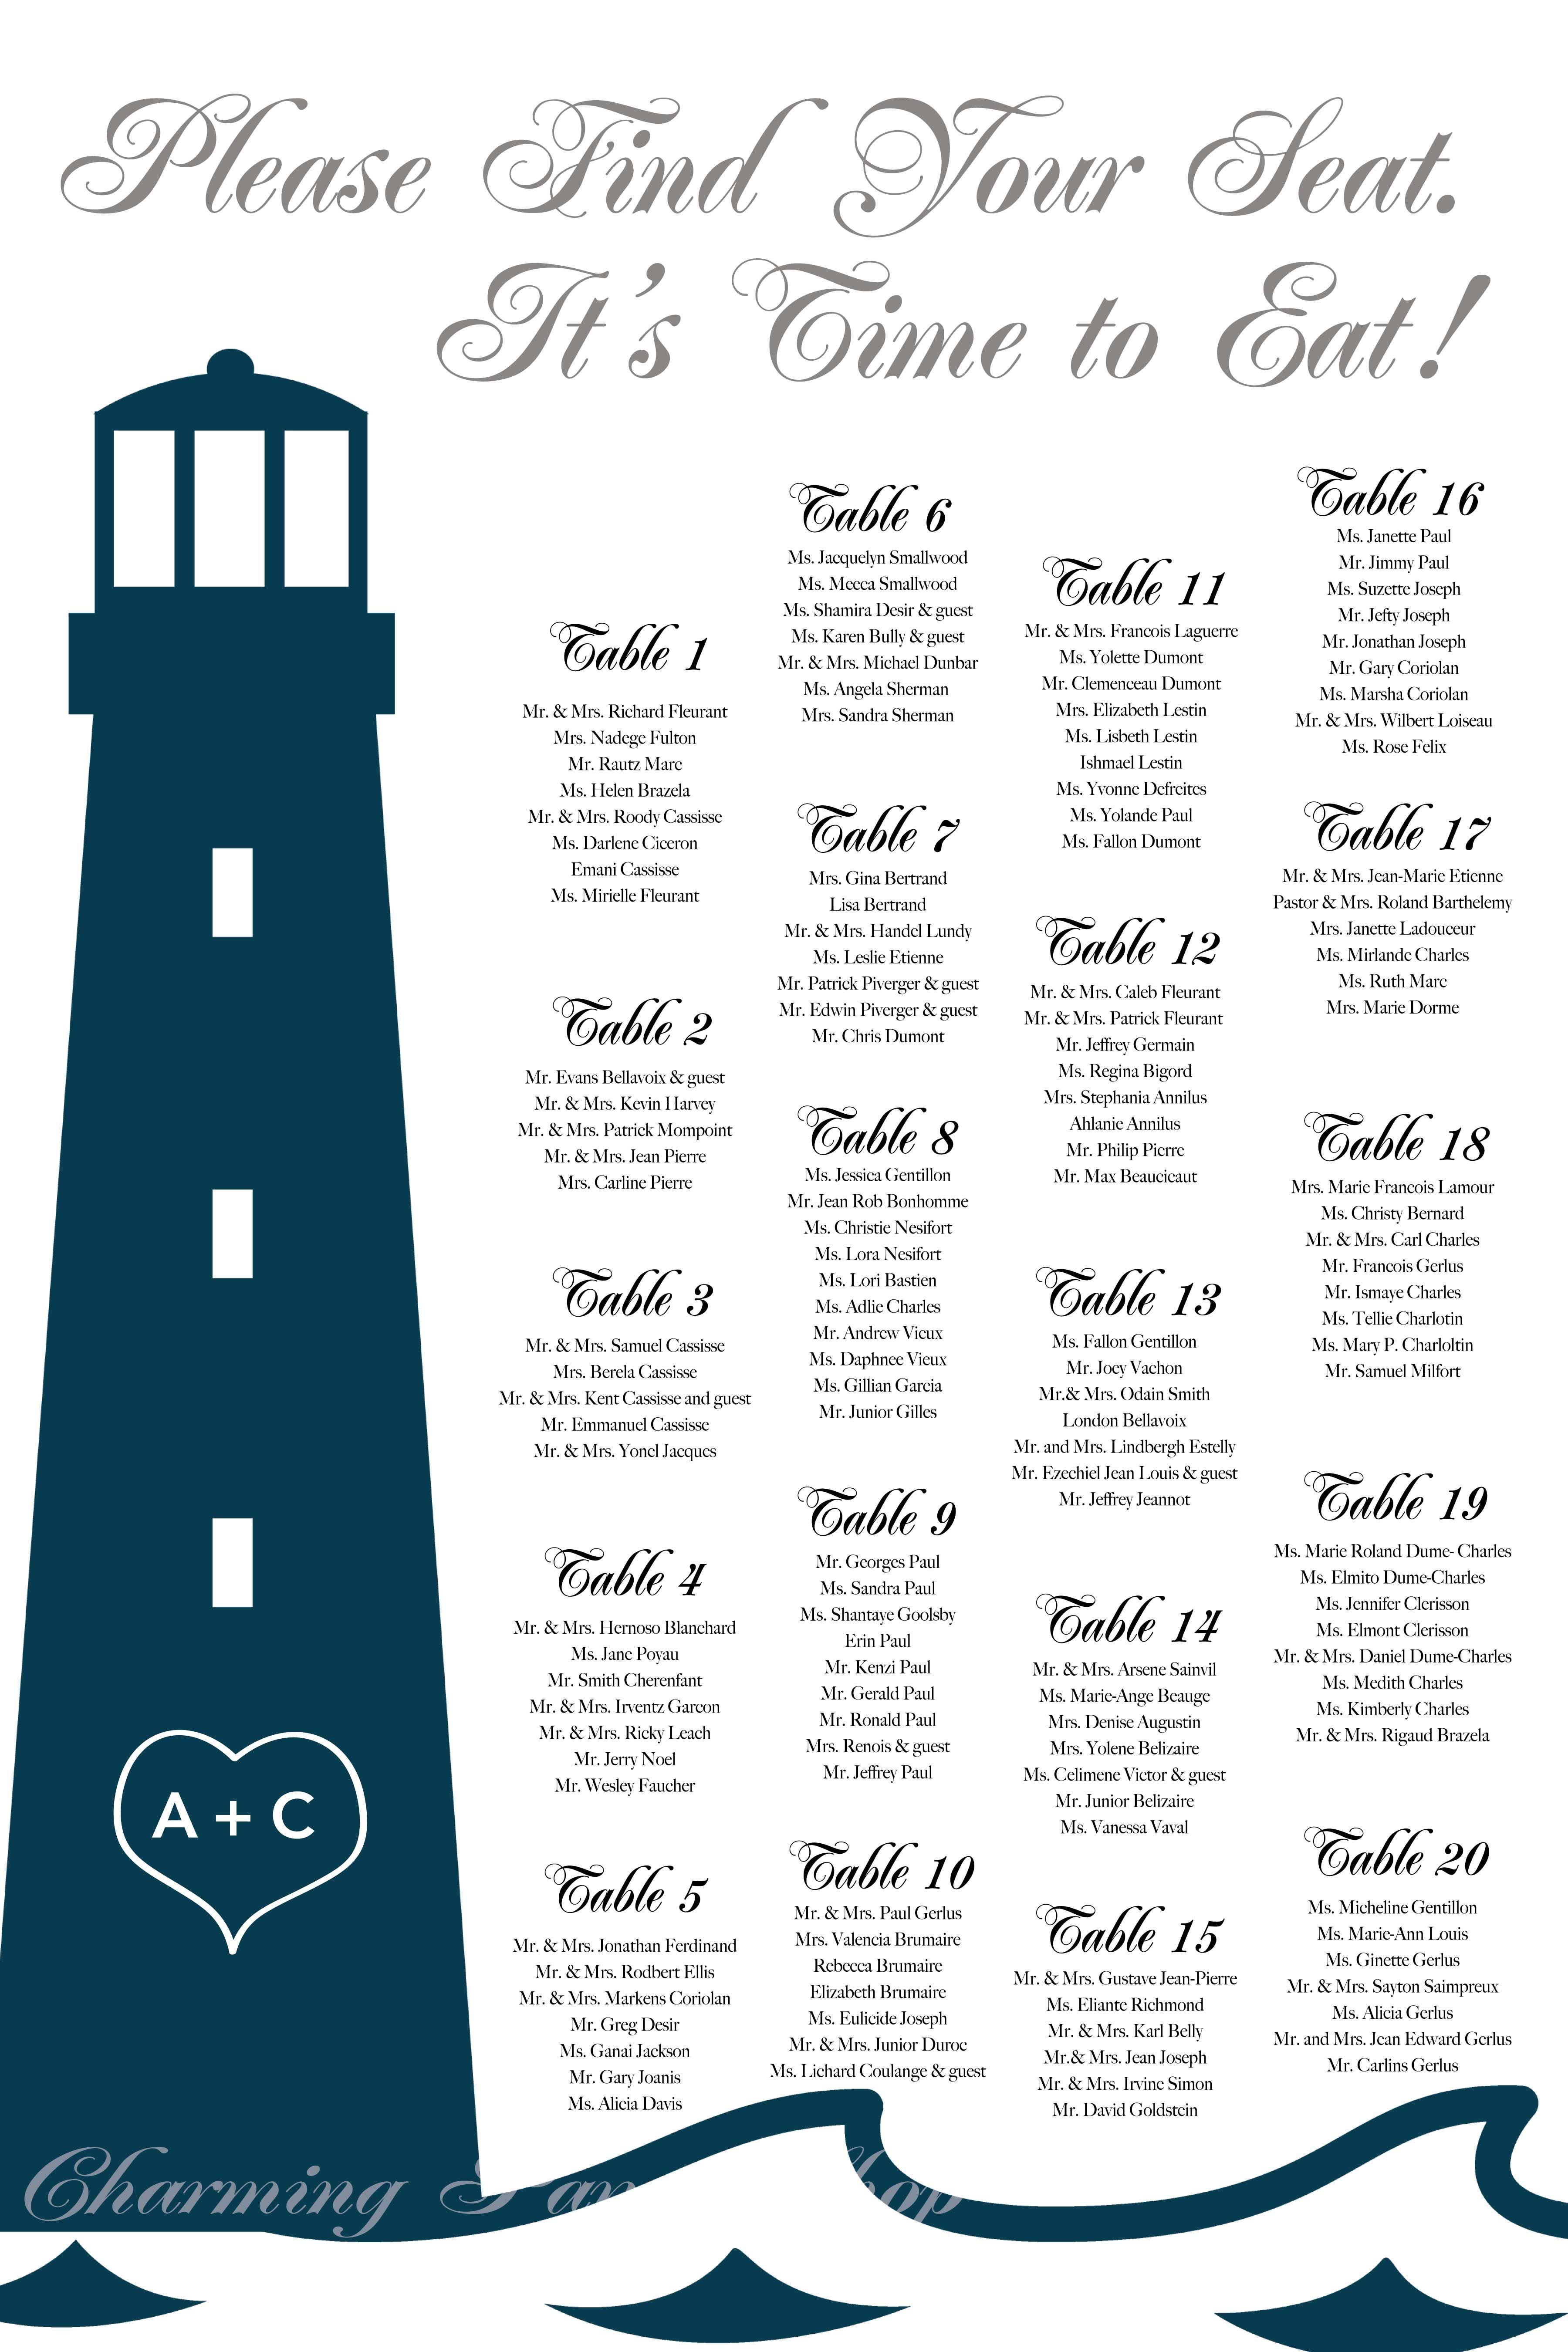 Nautical Wedding Beach Wedding Beach Party Nautical Themed Party Idea Seating Chart Template